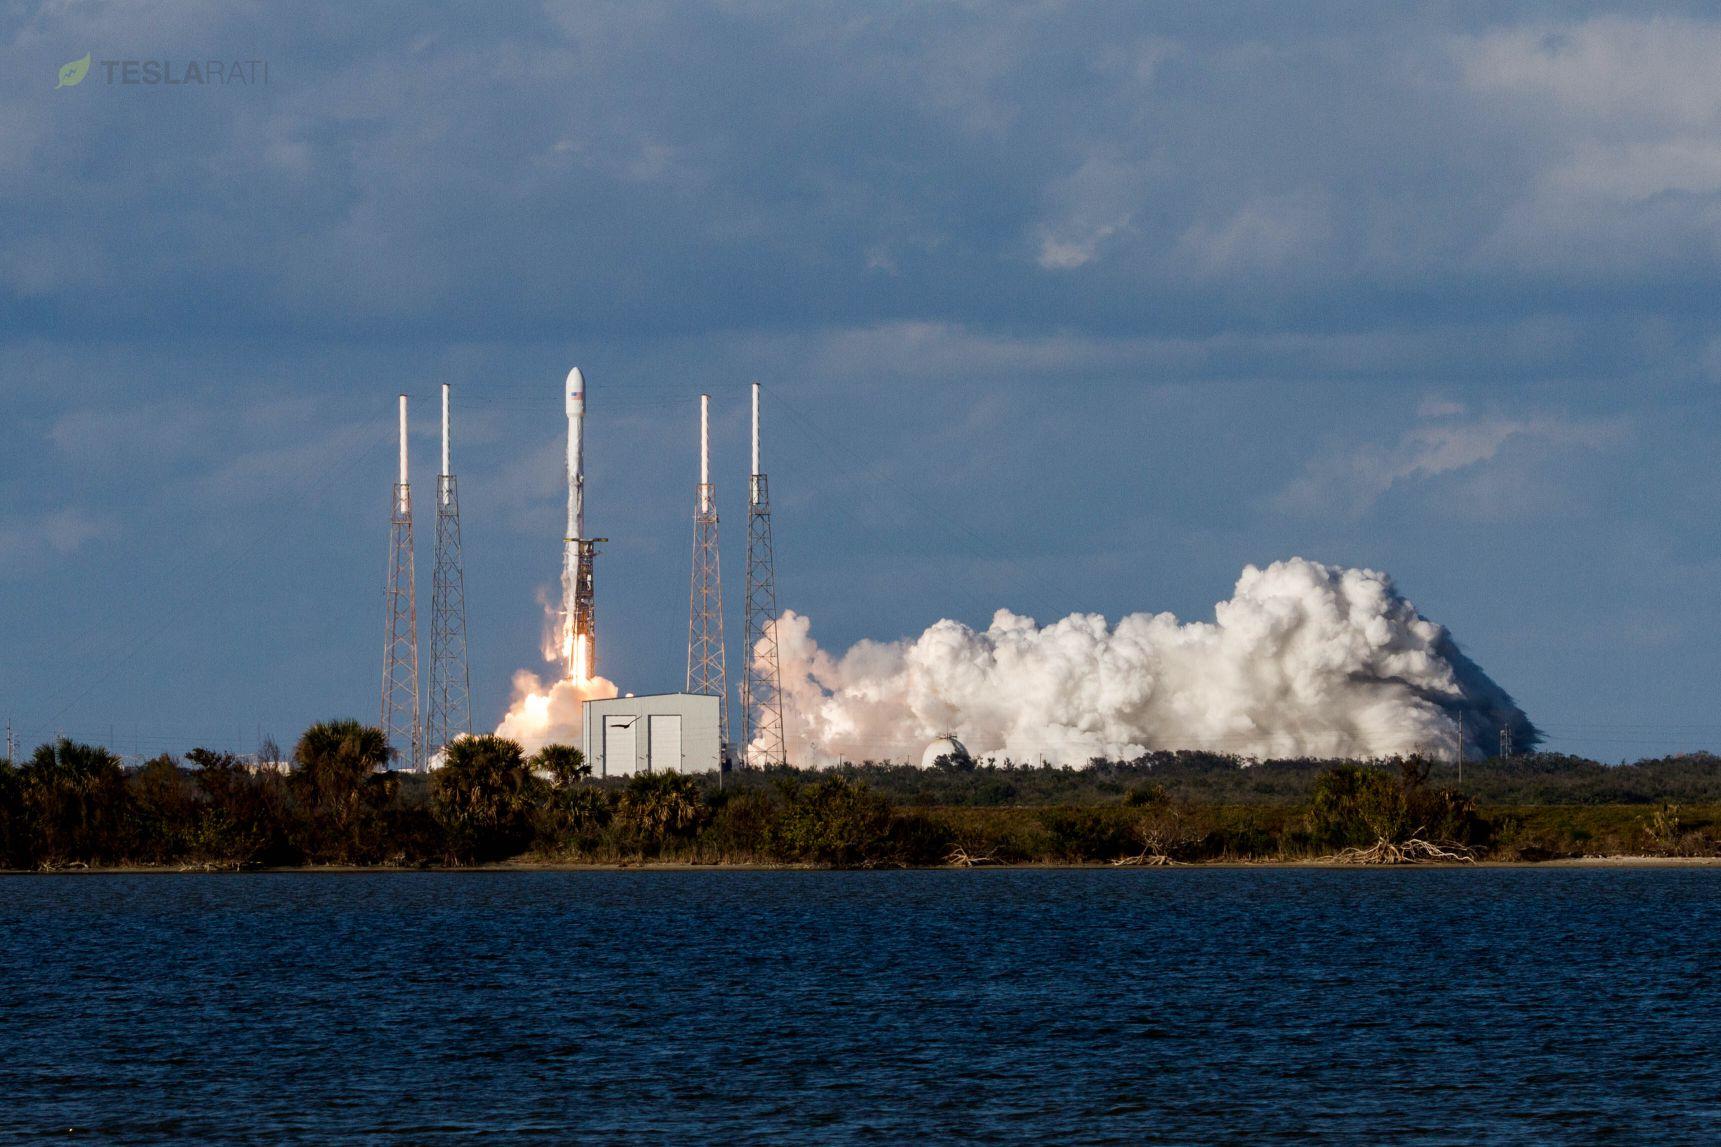 GovSat launch (Tom Cross)